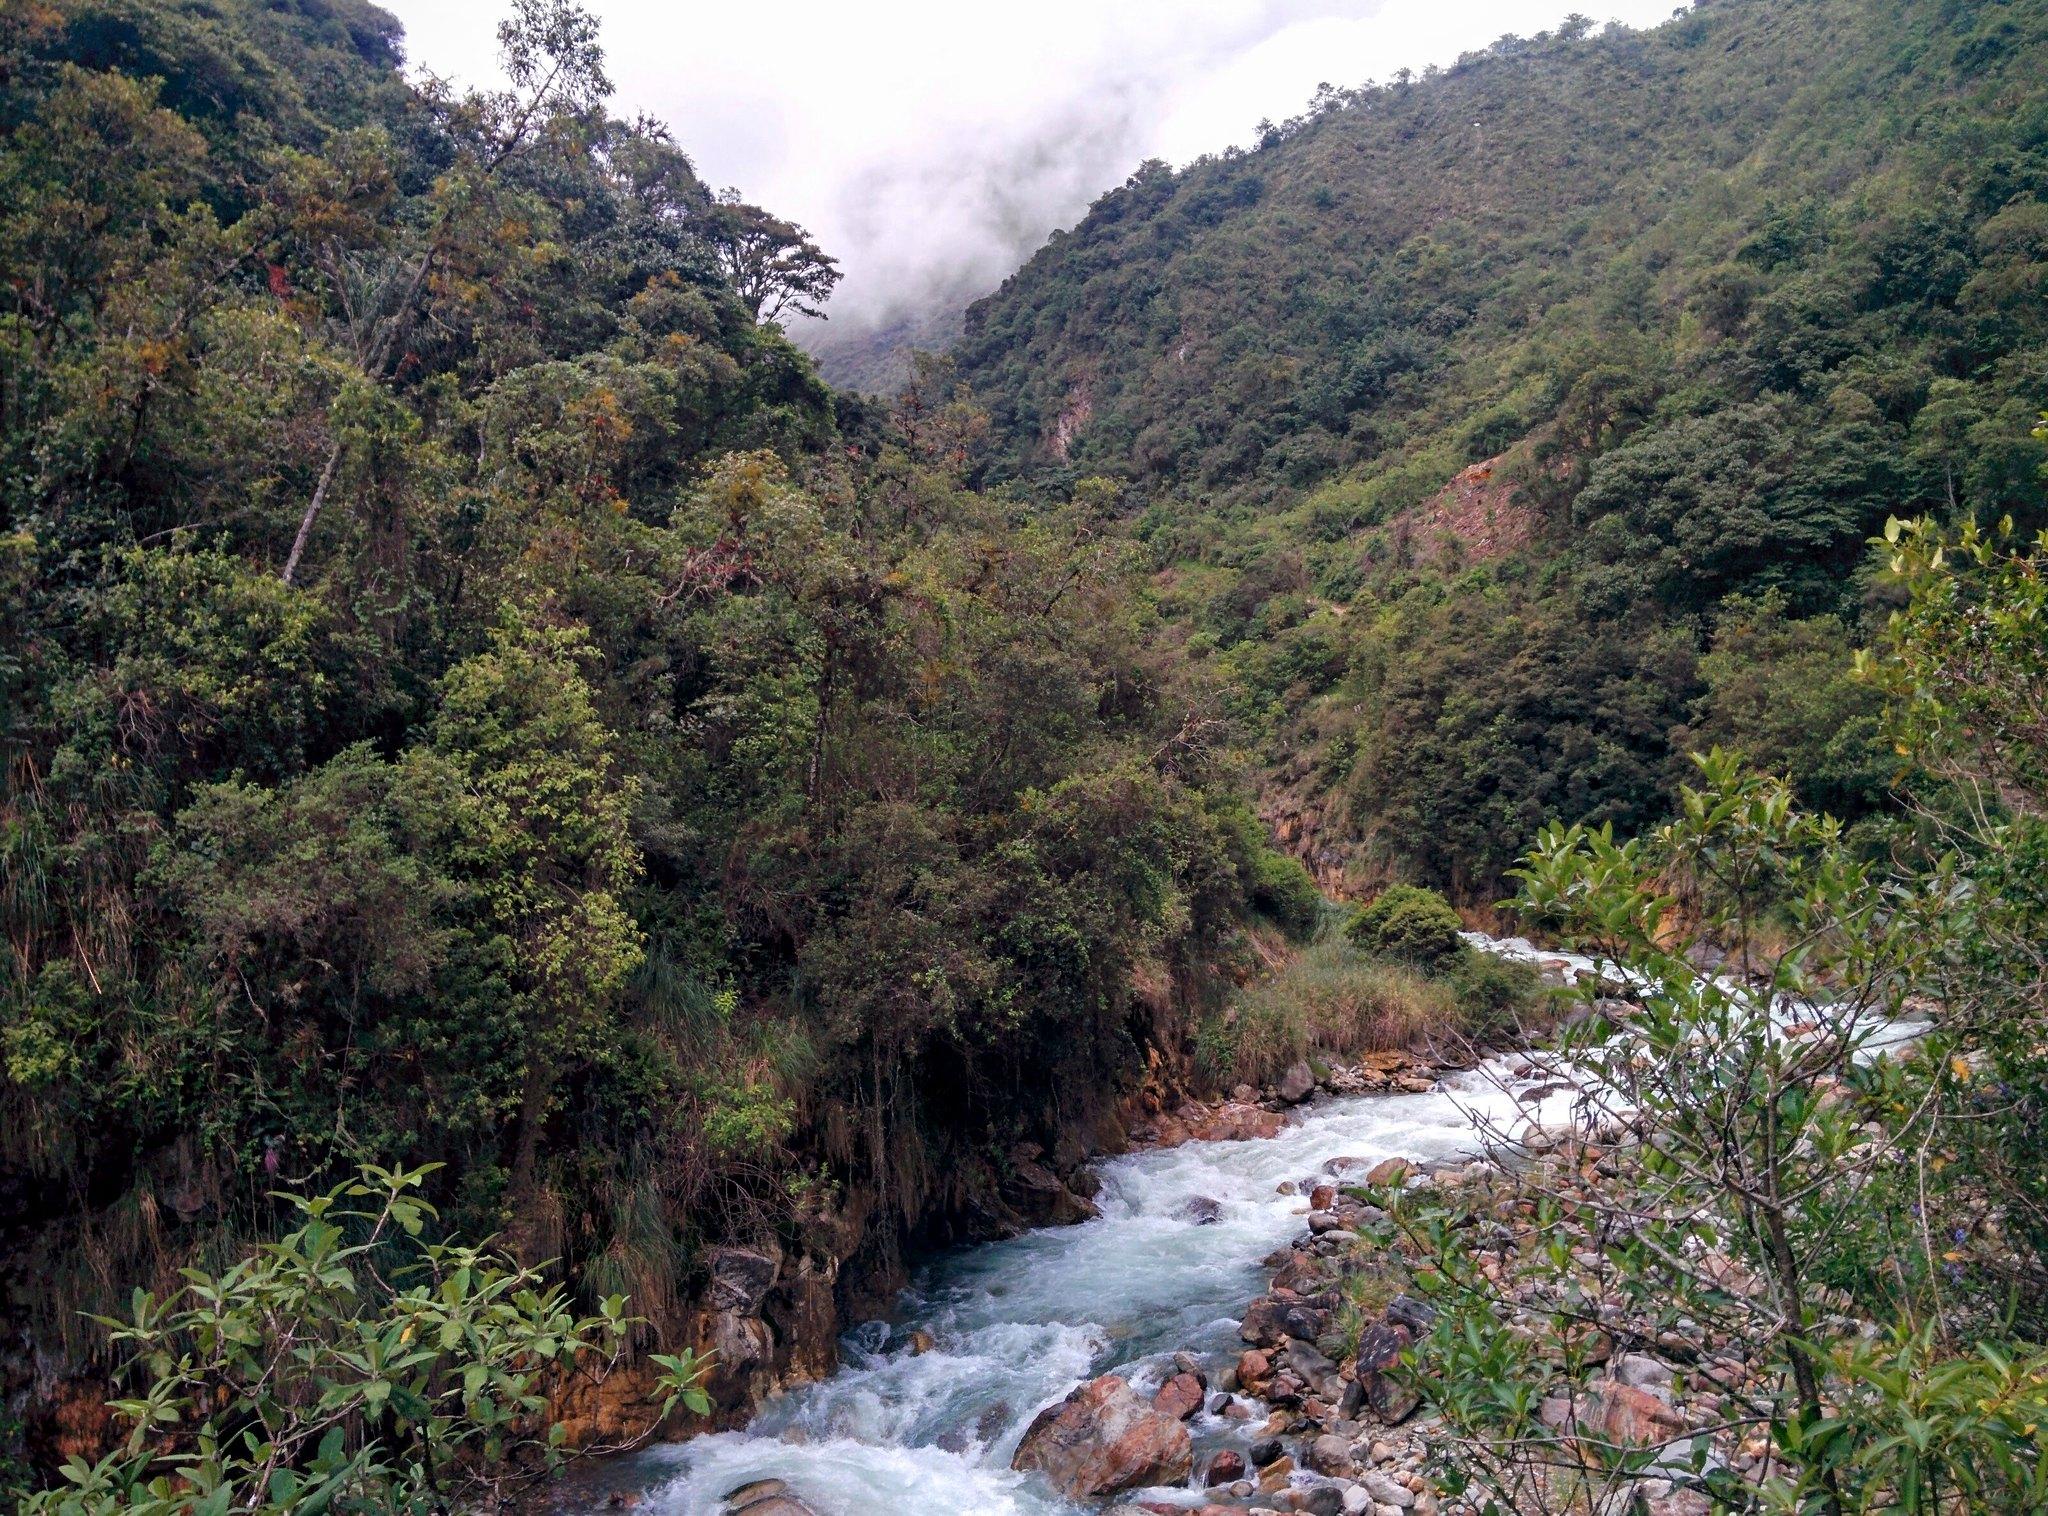 A river running through the jungle